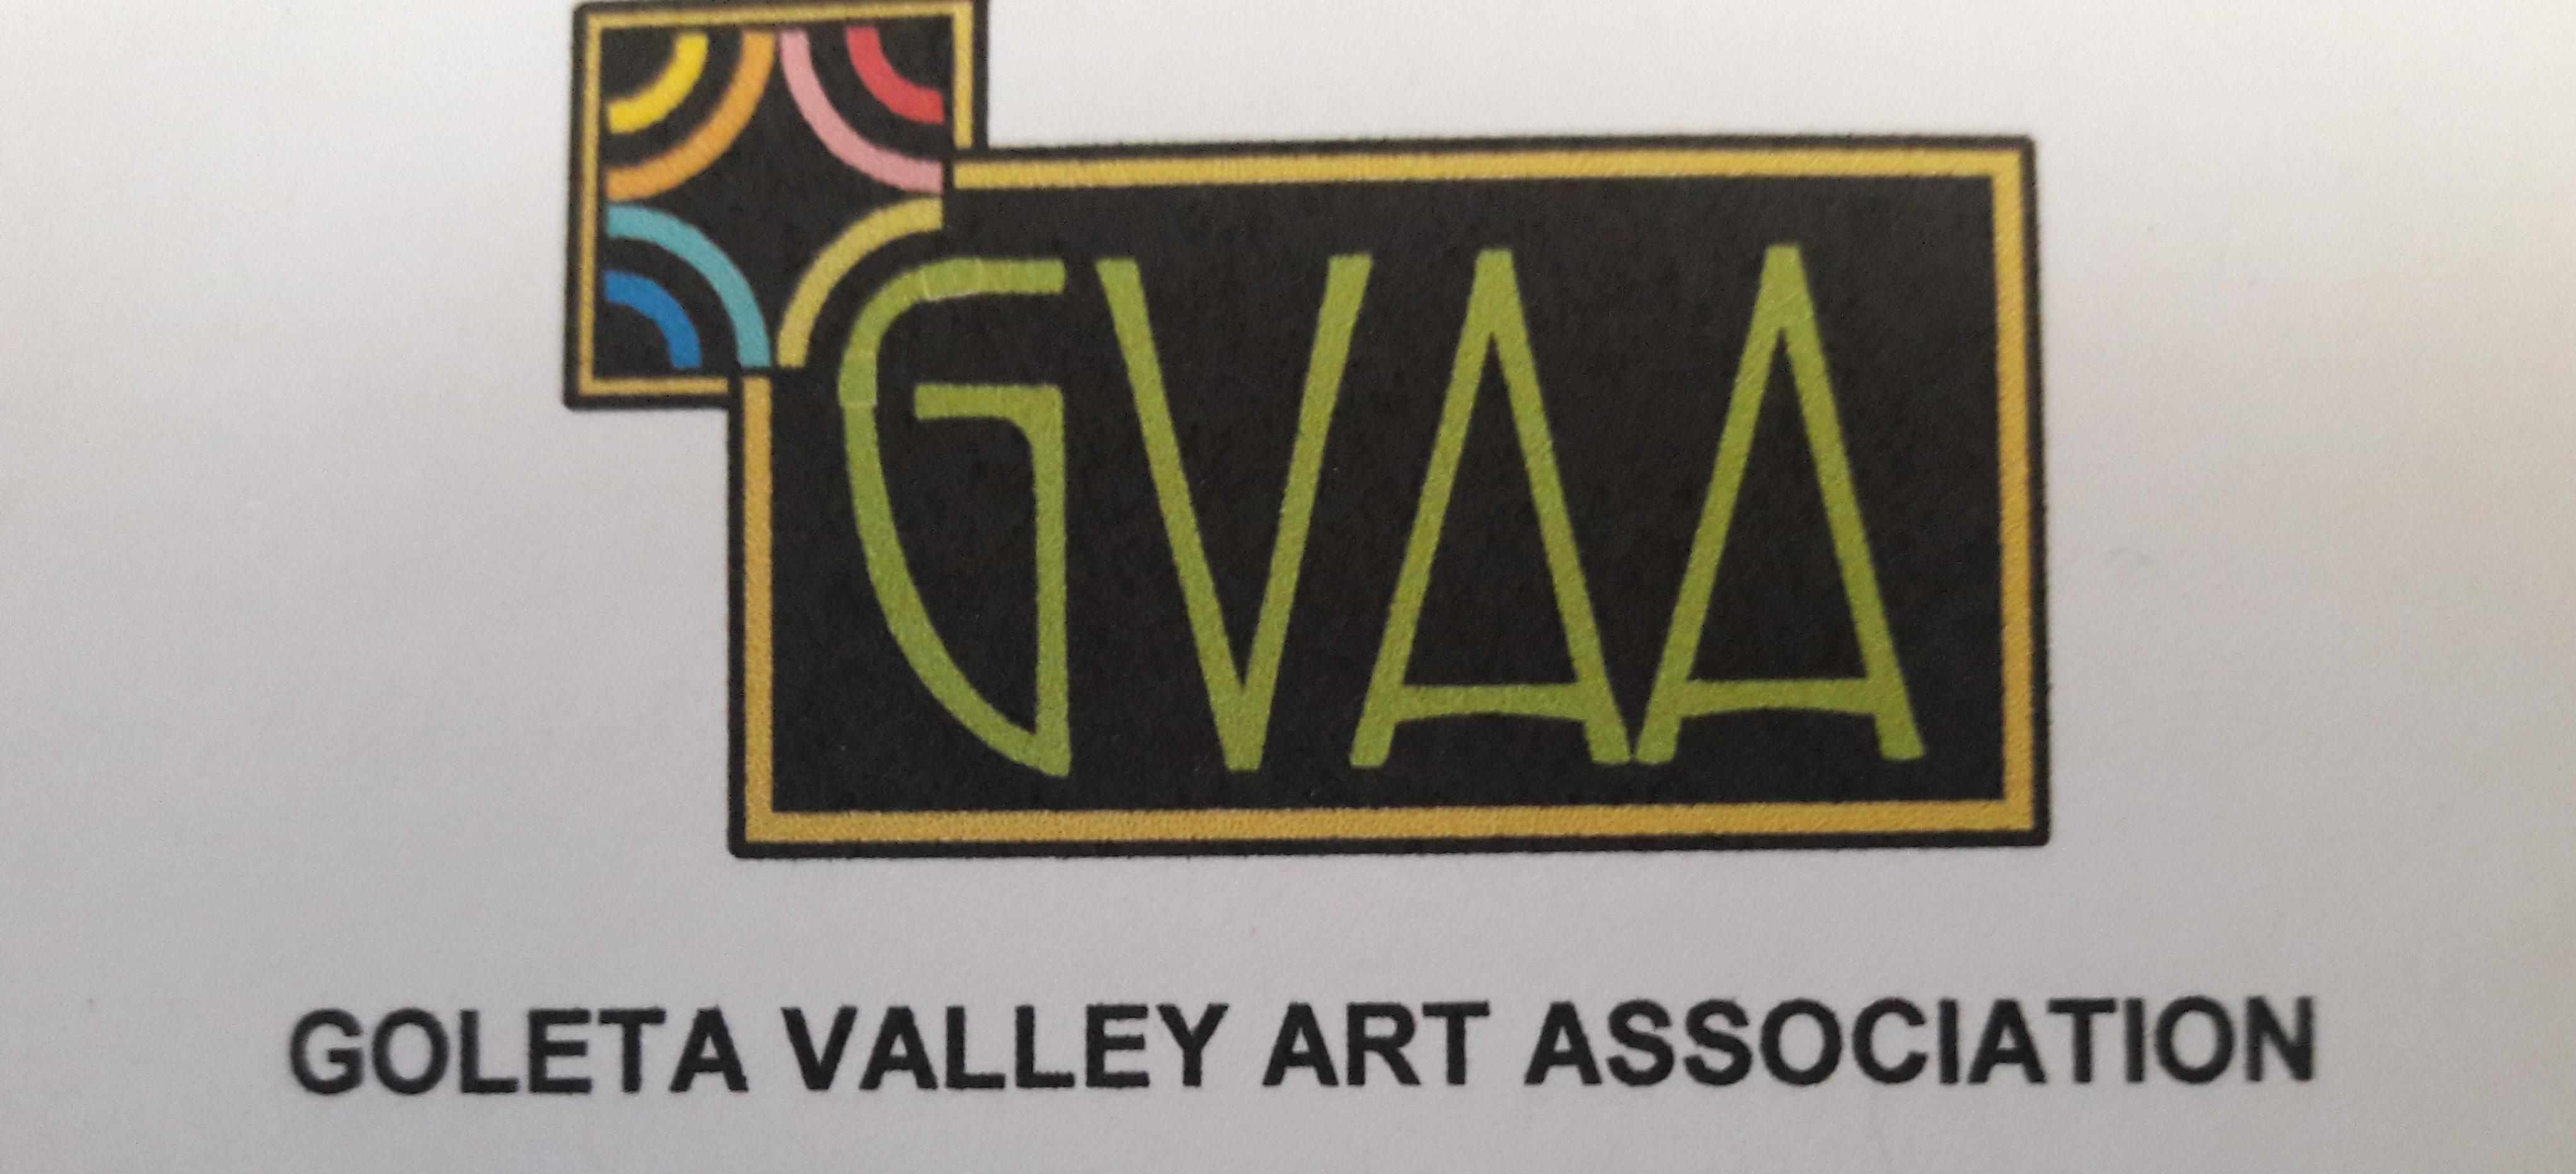 The Goleta Valley Art Association